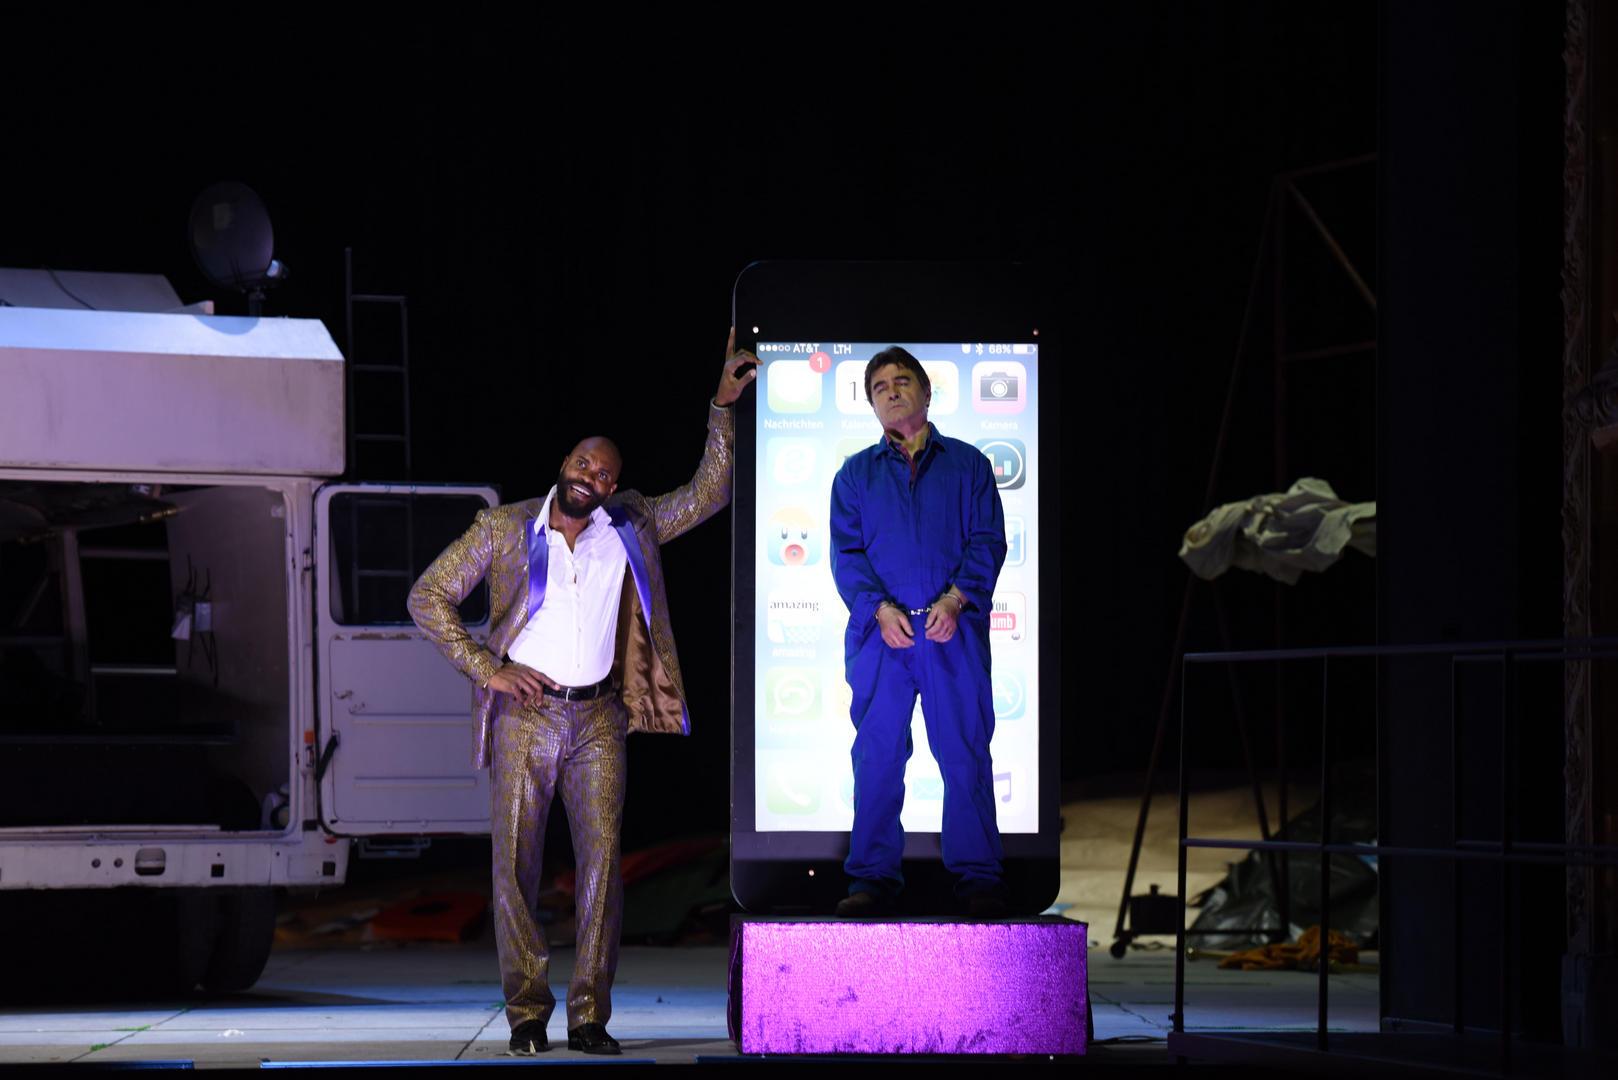 Mahagonny-Opera-by-Kurt-Weill-Stage-director-Jacopo-Spirei-Salzburg-20